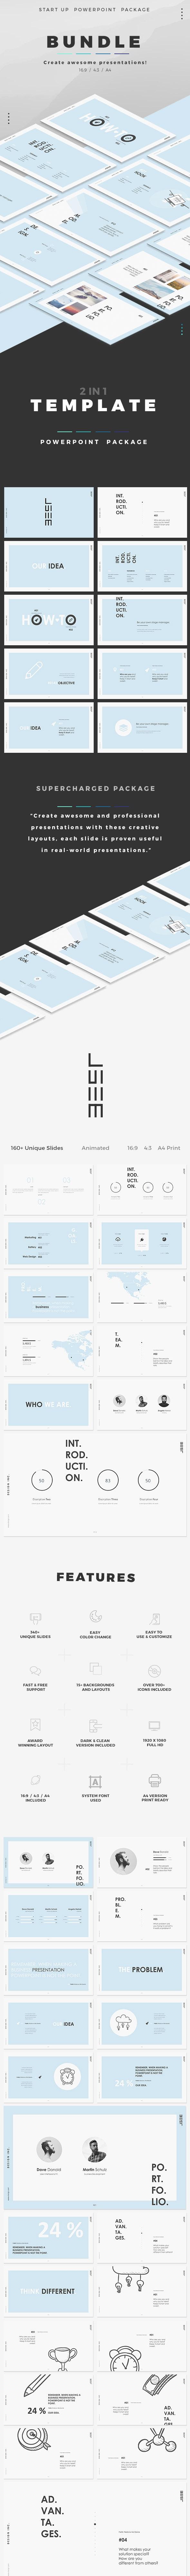 Design Bundle Powerpoint - PowerPoint Templates Presentation Templates